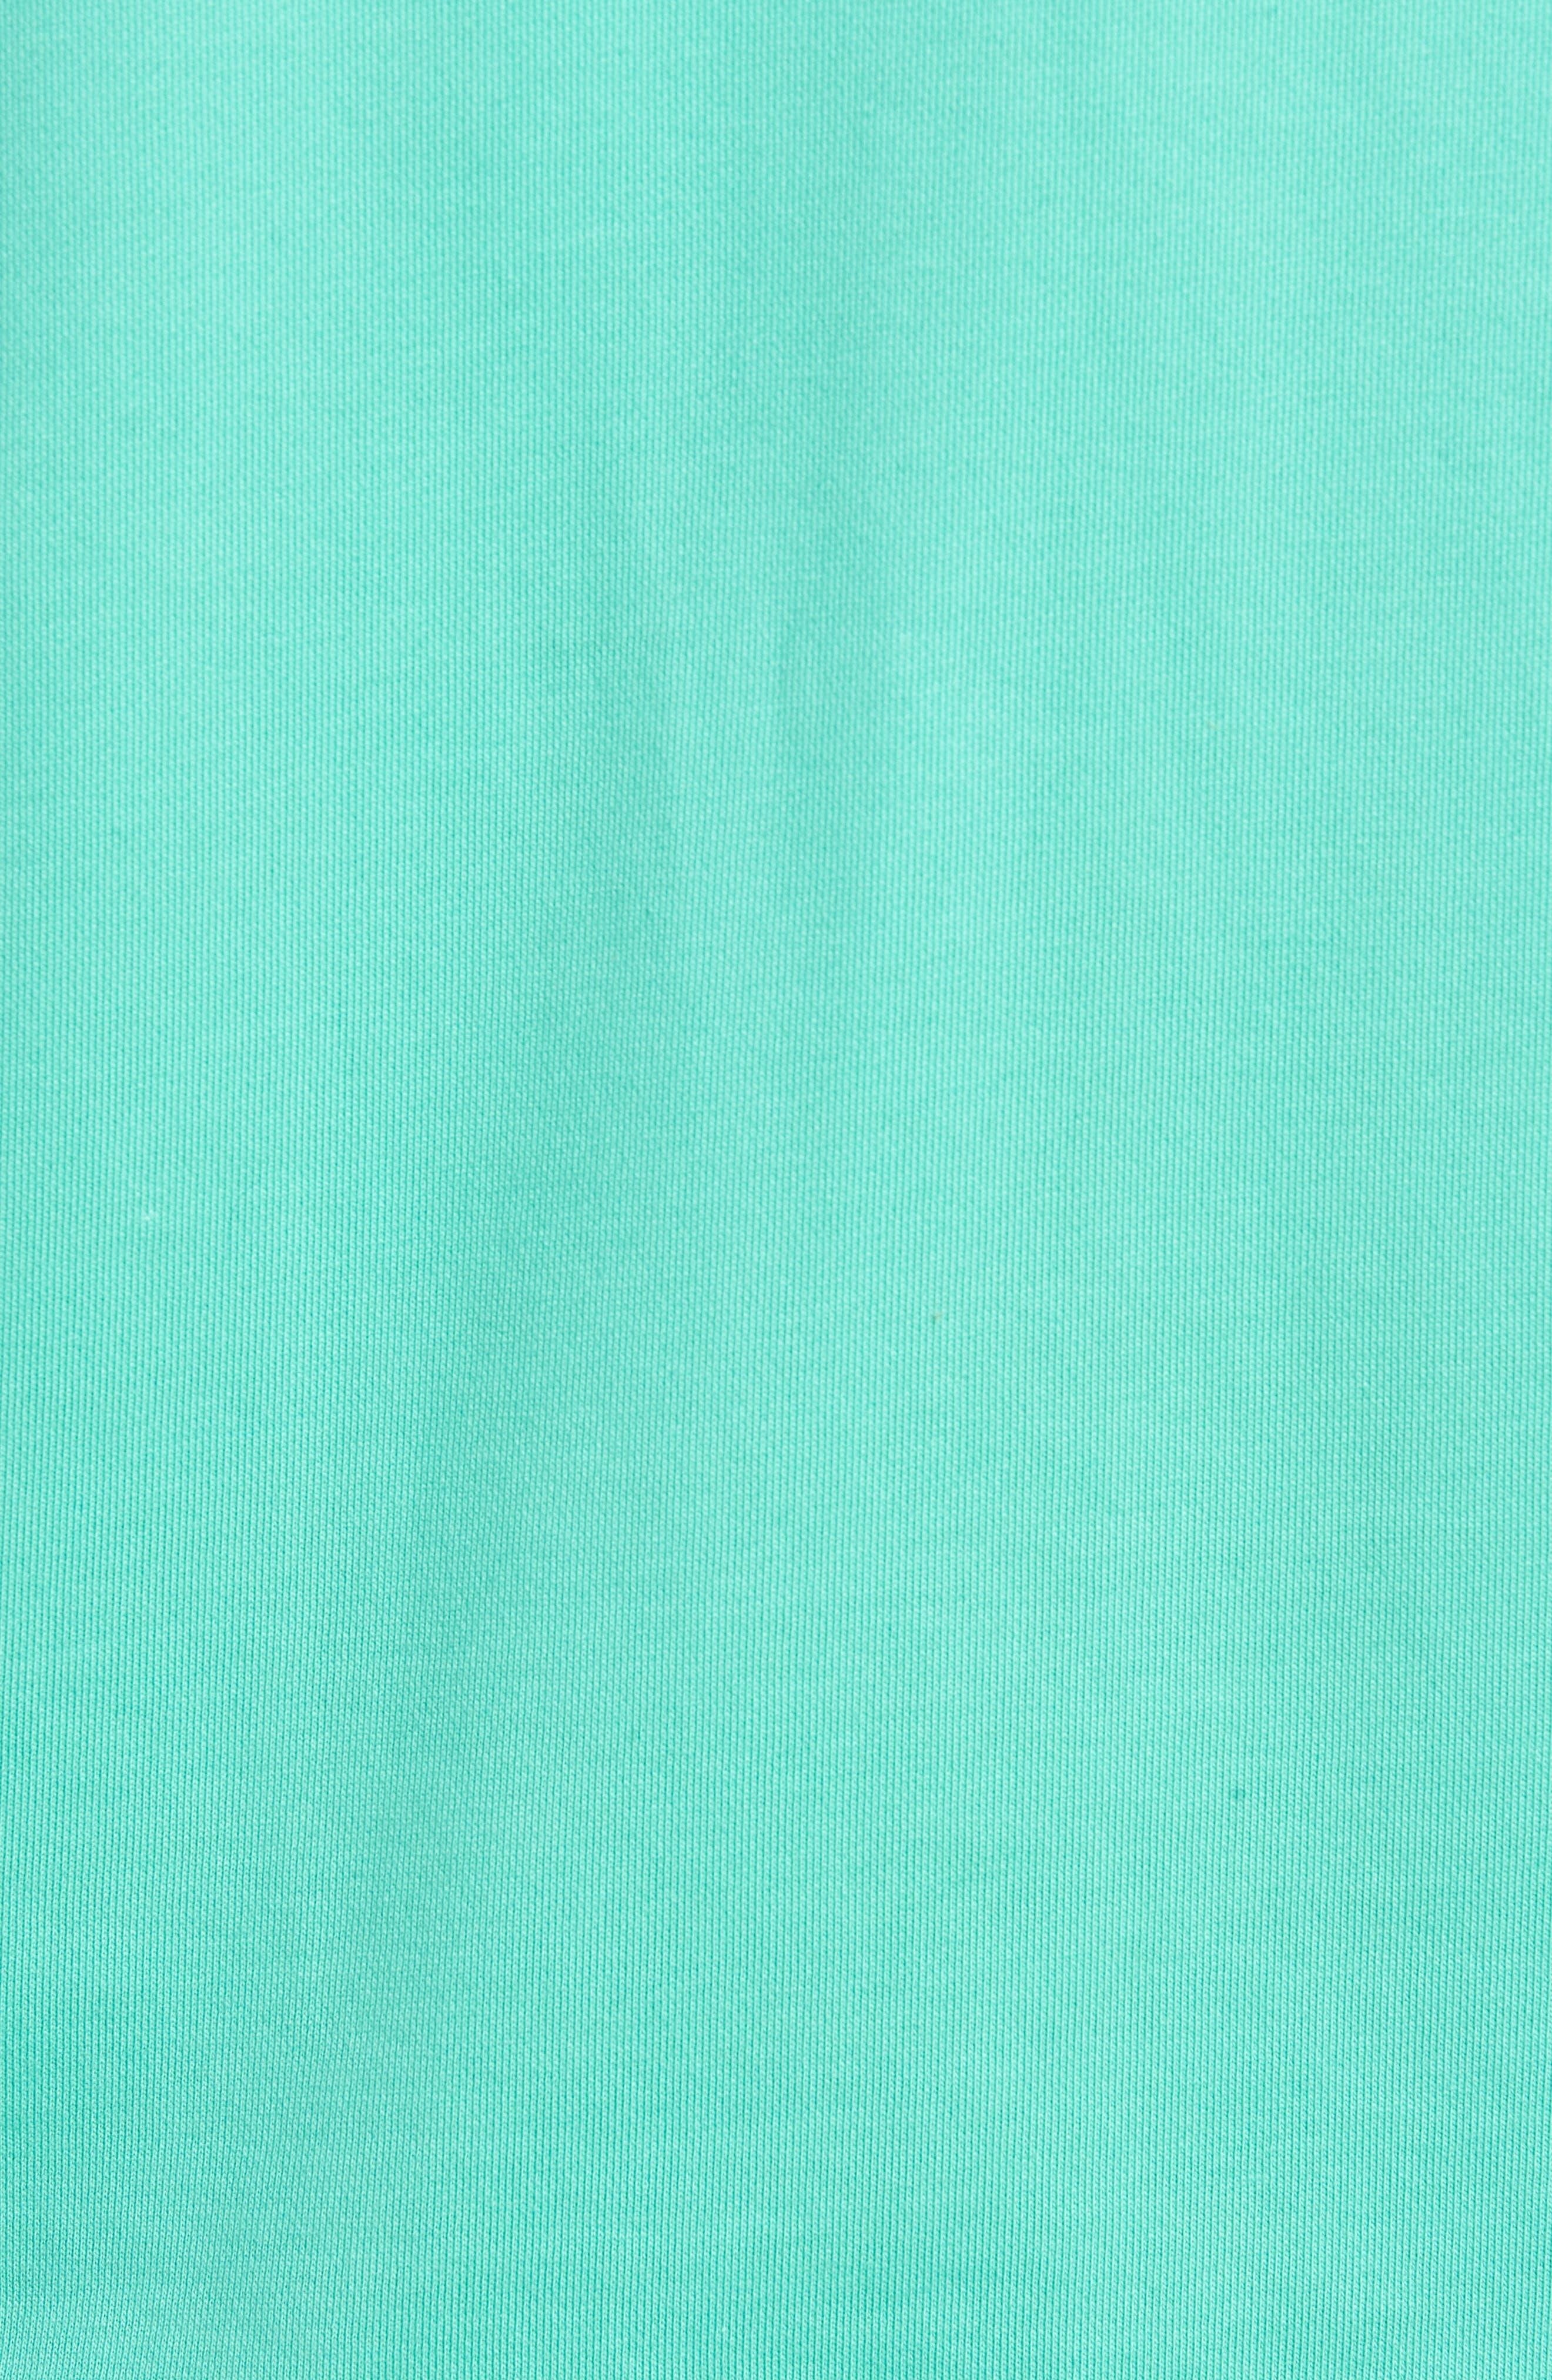 Bowery Embroidered Fleece Sweatshirt,                             Alternate thumbnail 5, color,                             SEAFOAM GREEN